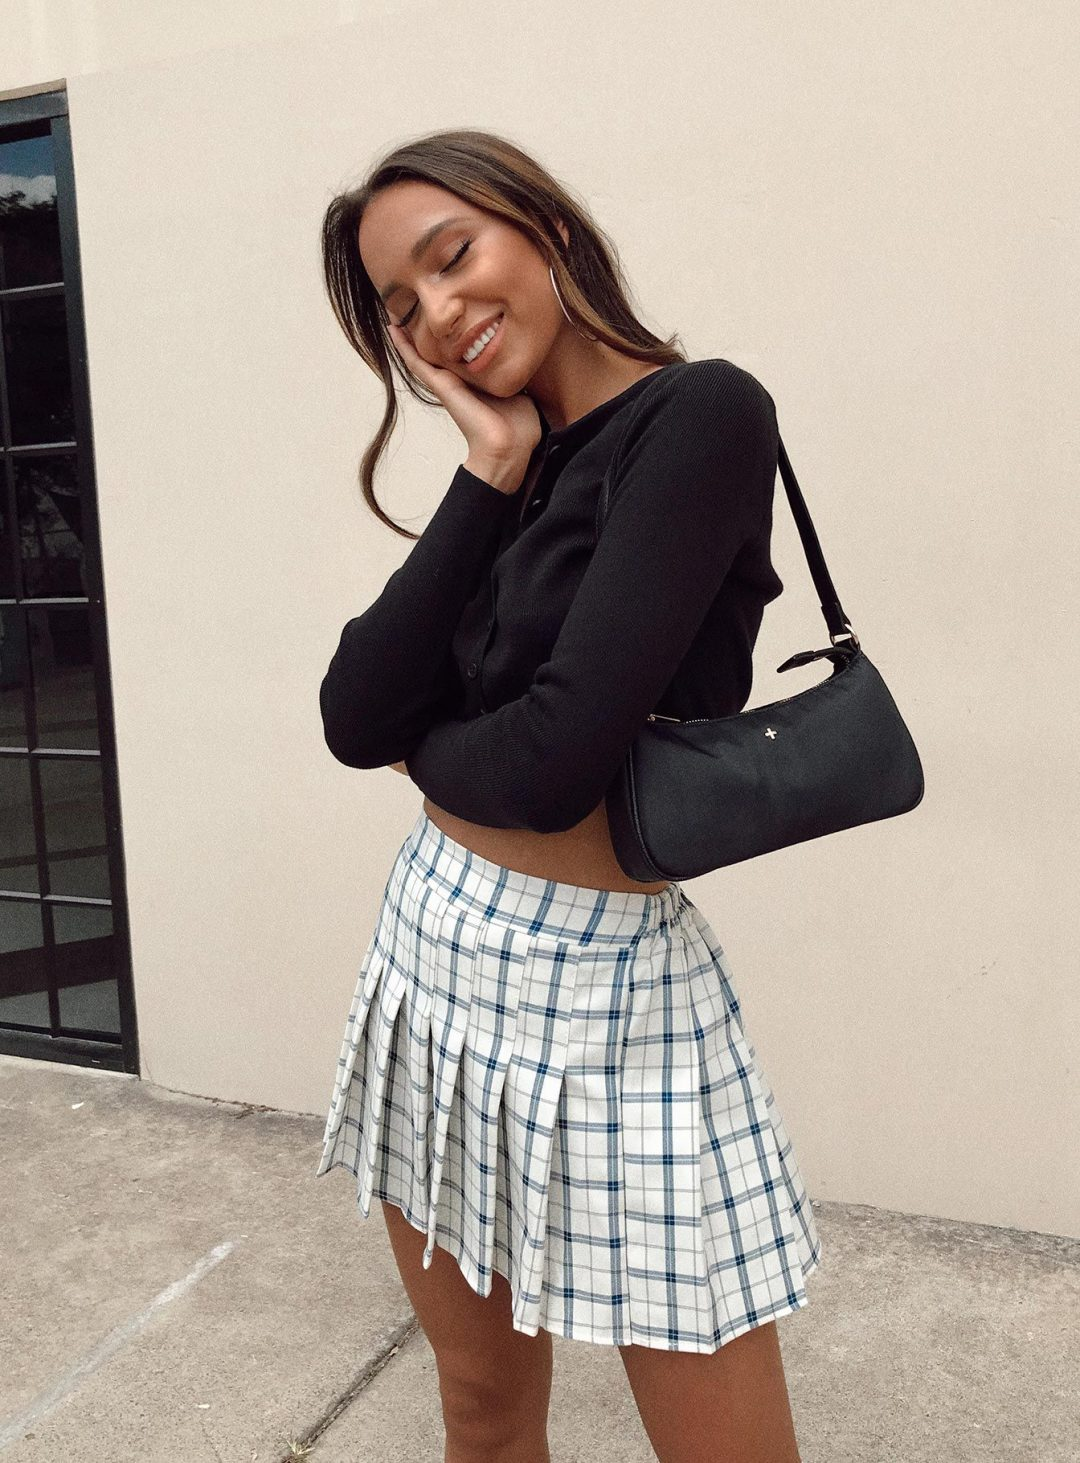 Plaid mini skirt outfits